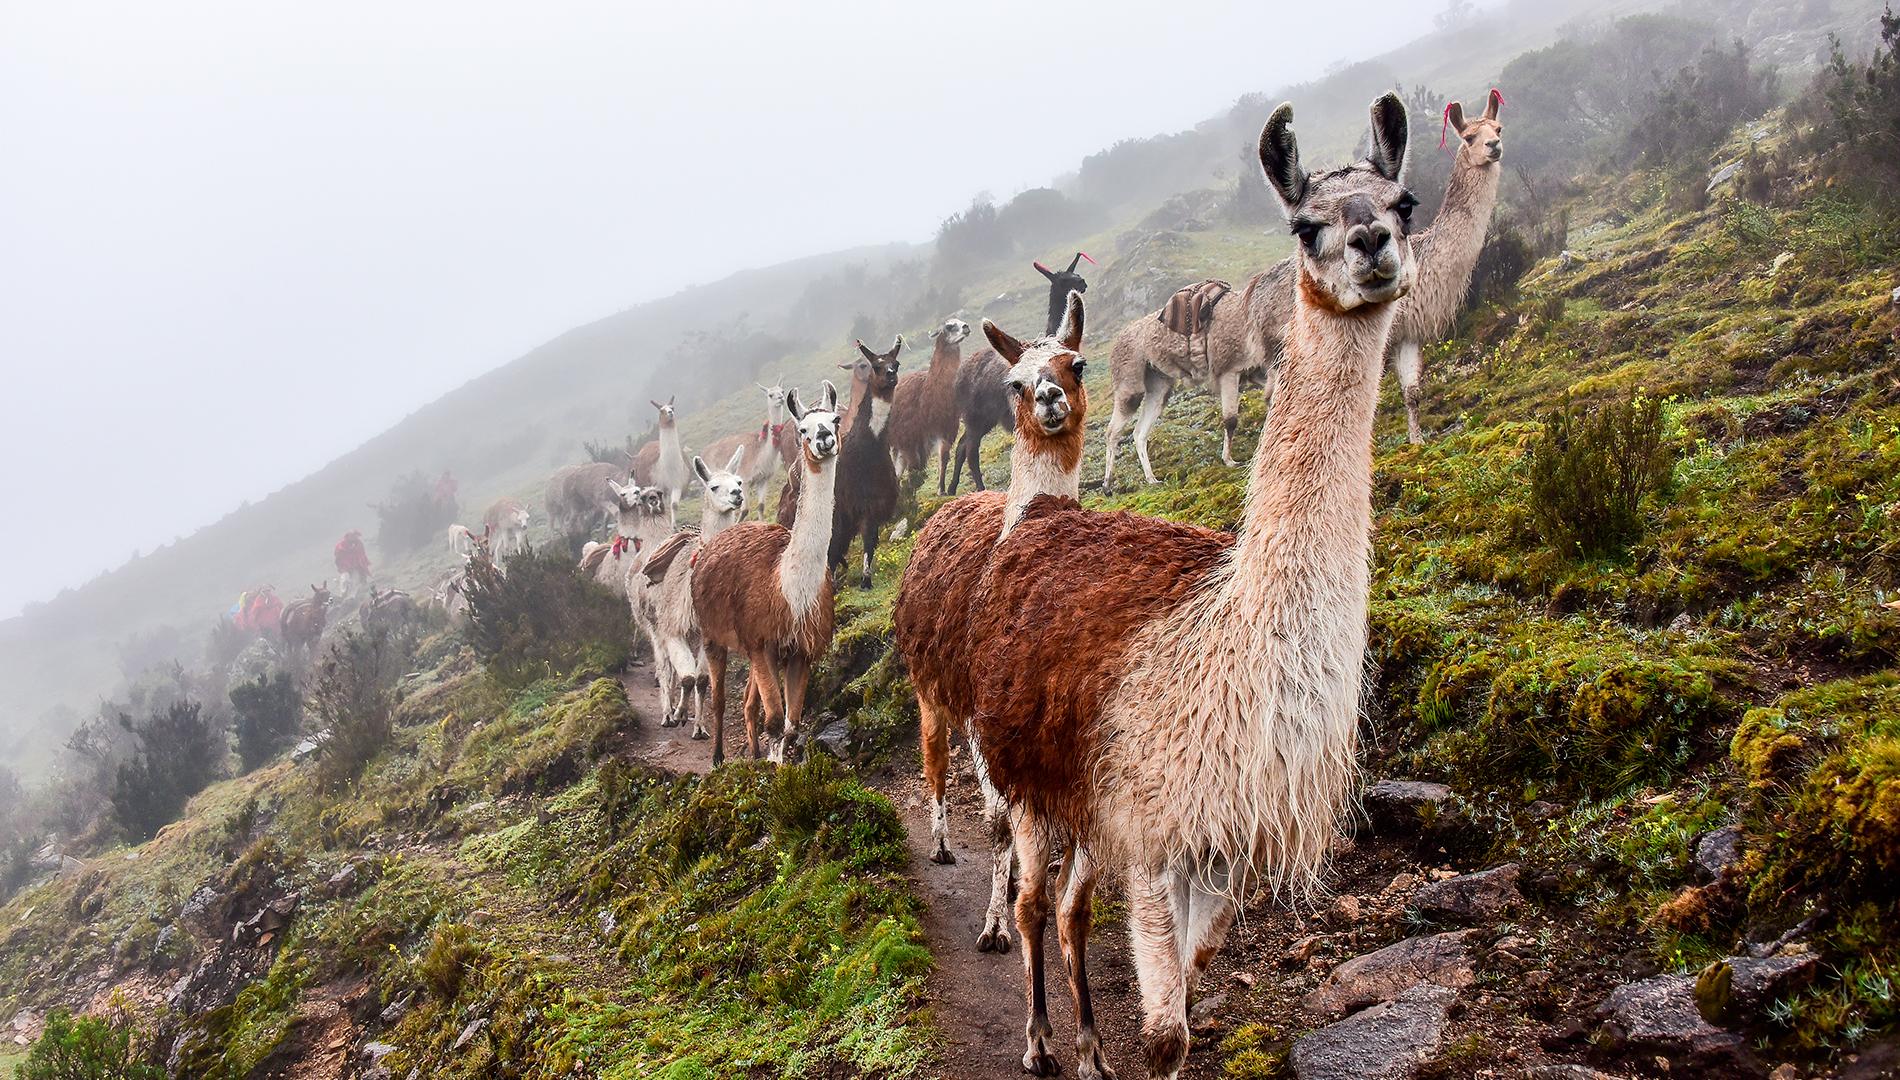 11. Llamas & Monkeys